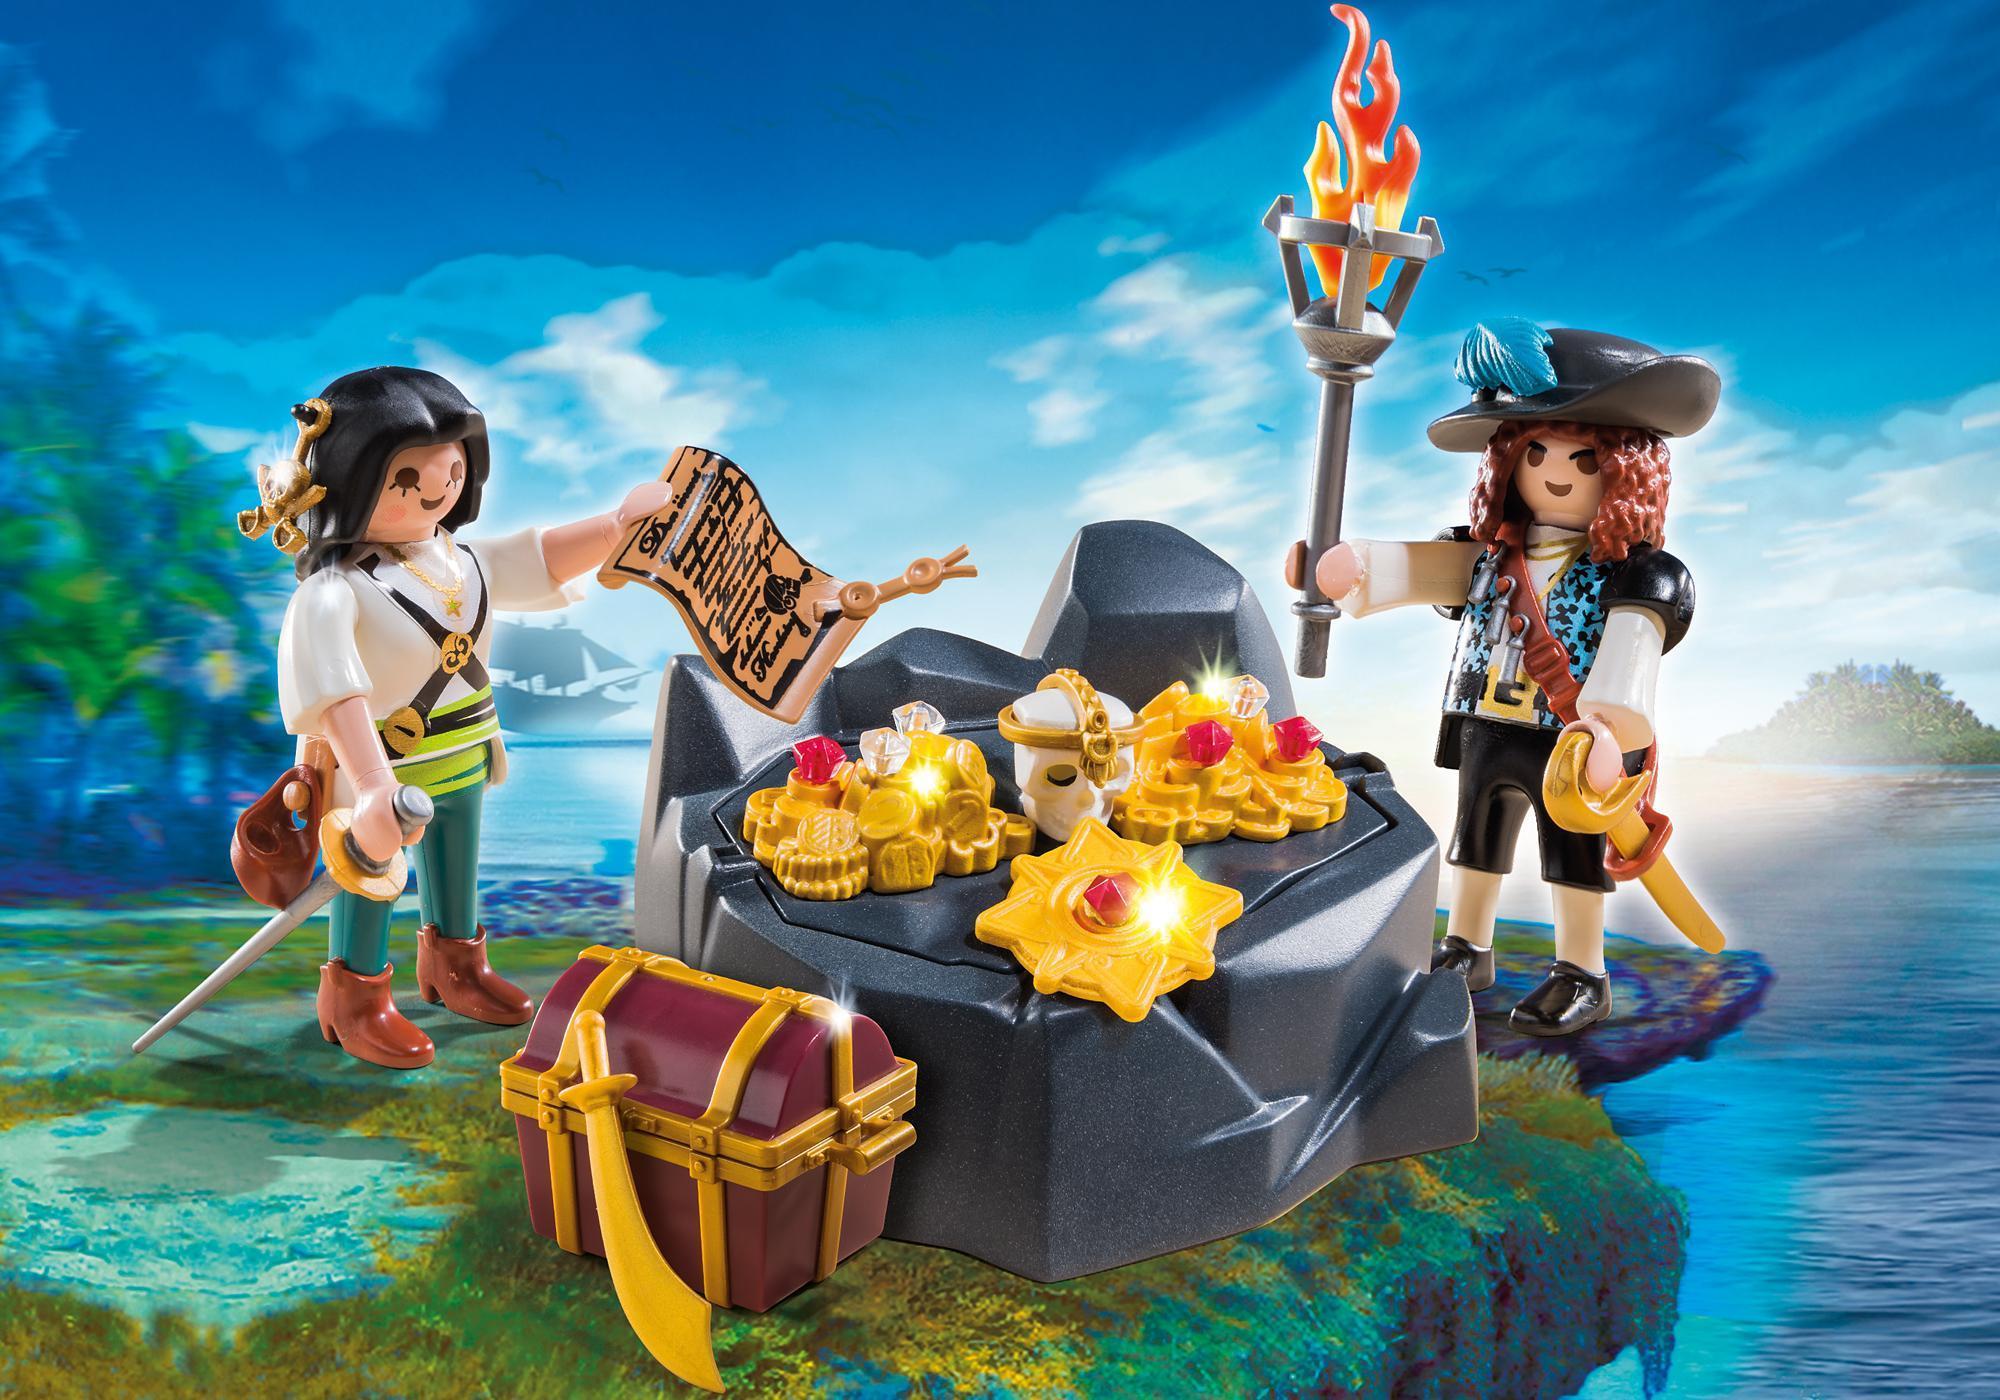 http://media.playmobil.com/i/playmobil/6683_product_detail/Piraten-Schatzversteck